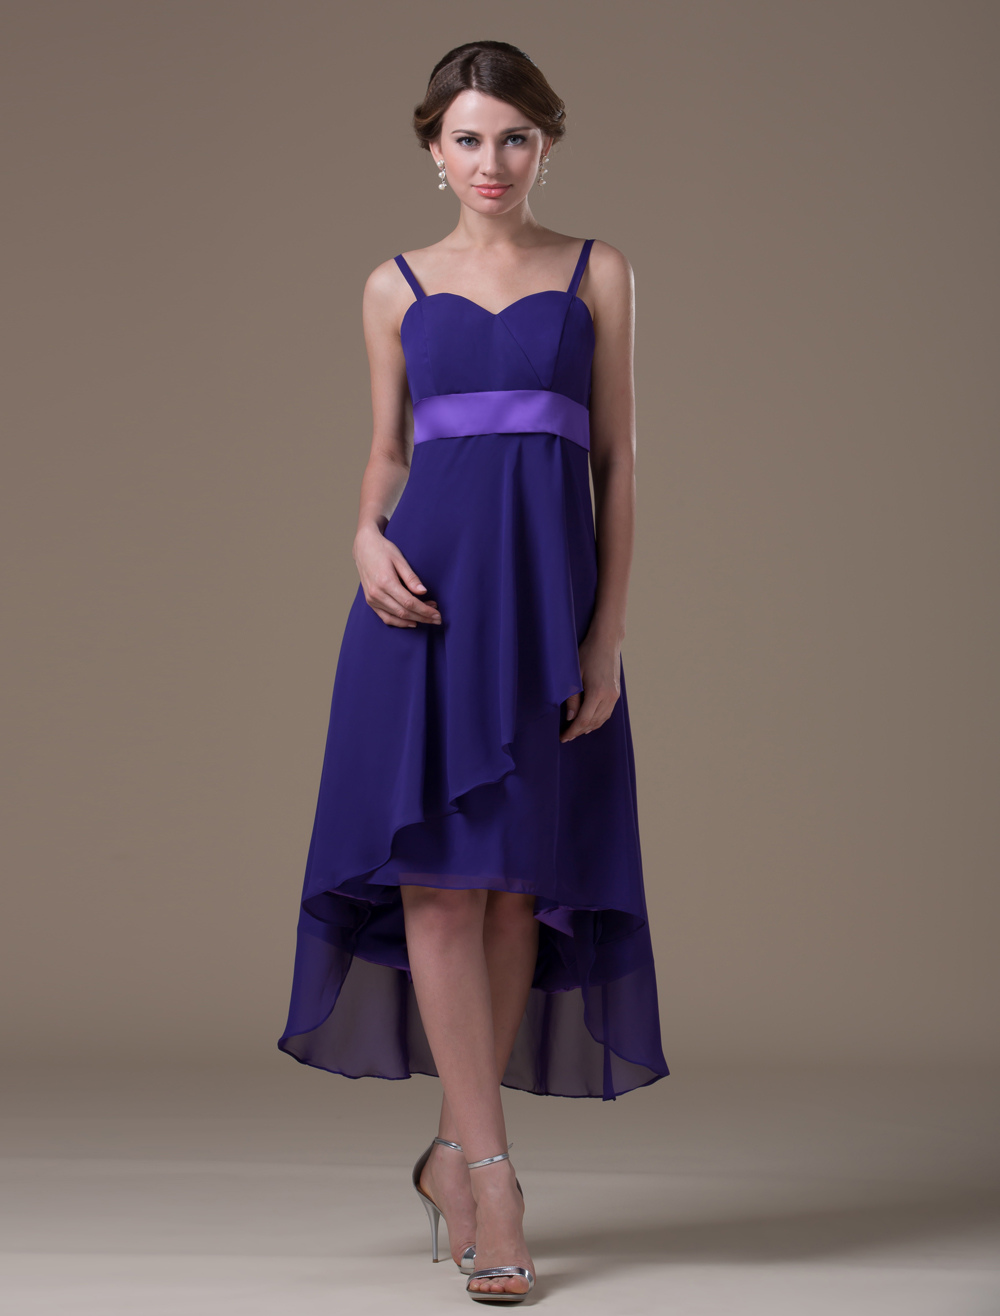 Buy Grape Elastic Woven Satin Tea Length Maternity Bridesmaid Dress for $119.99 in Milanoo store